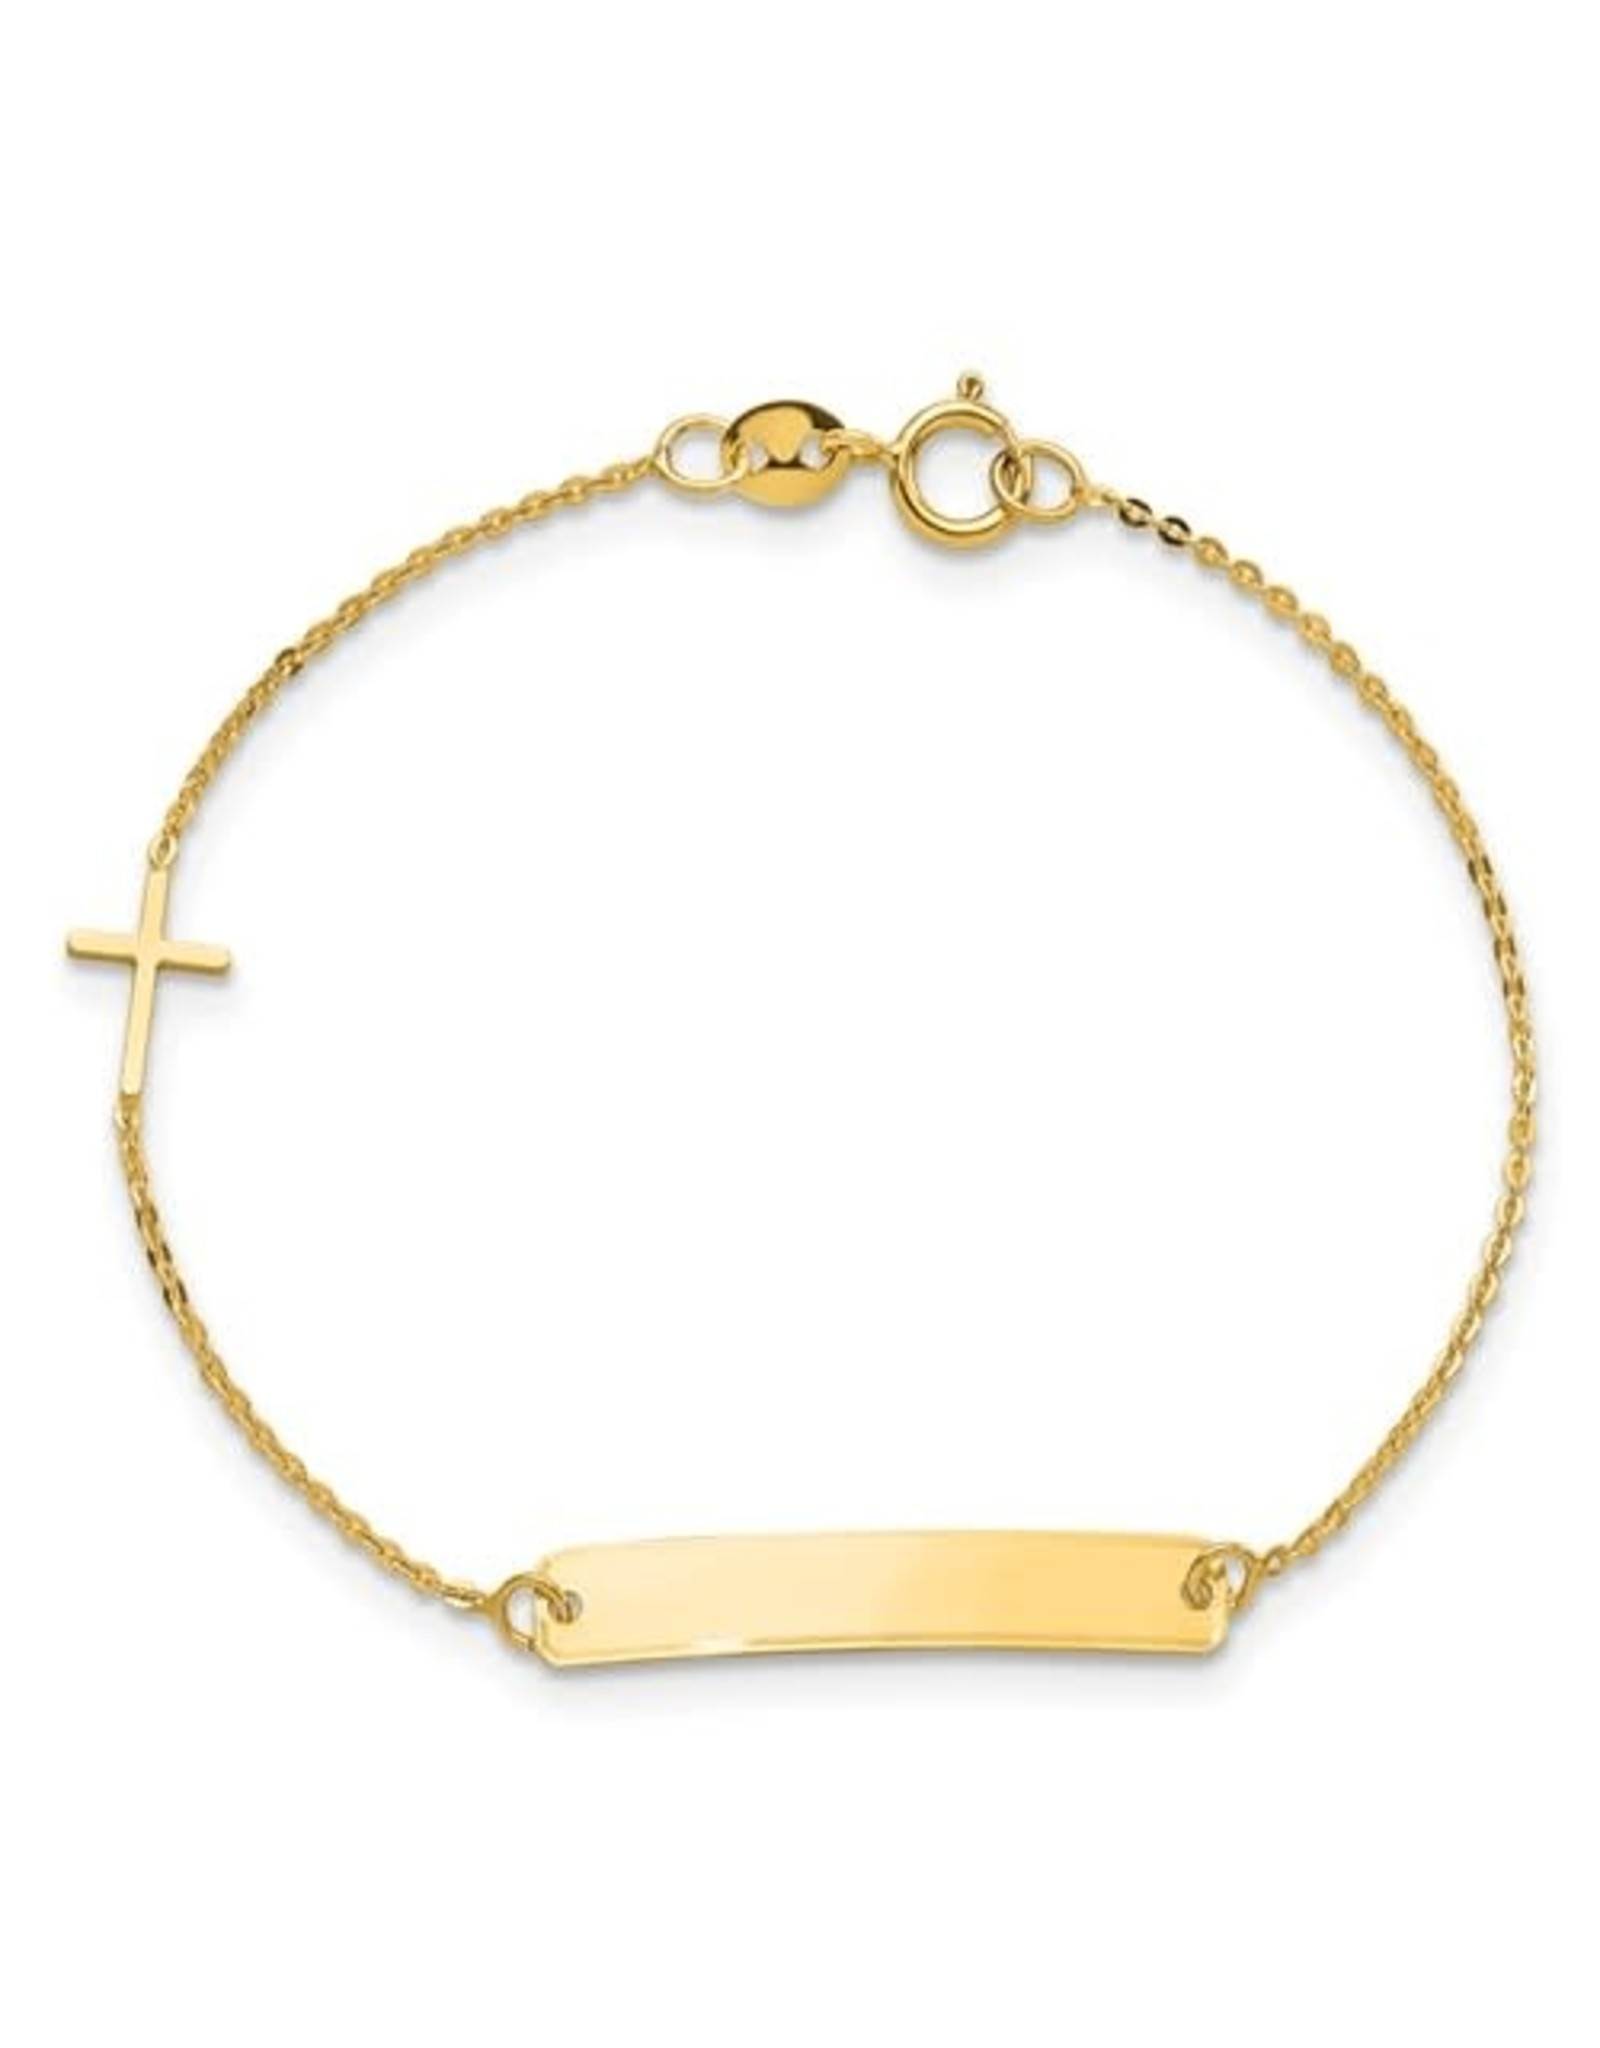 "14K Yellow Gold Baby ID Bracelet with Cross, 5.5"""